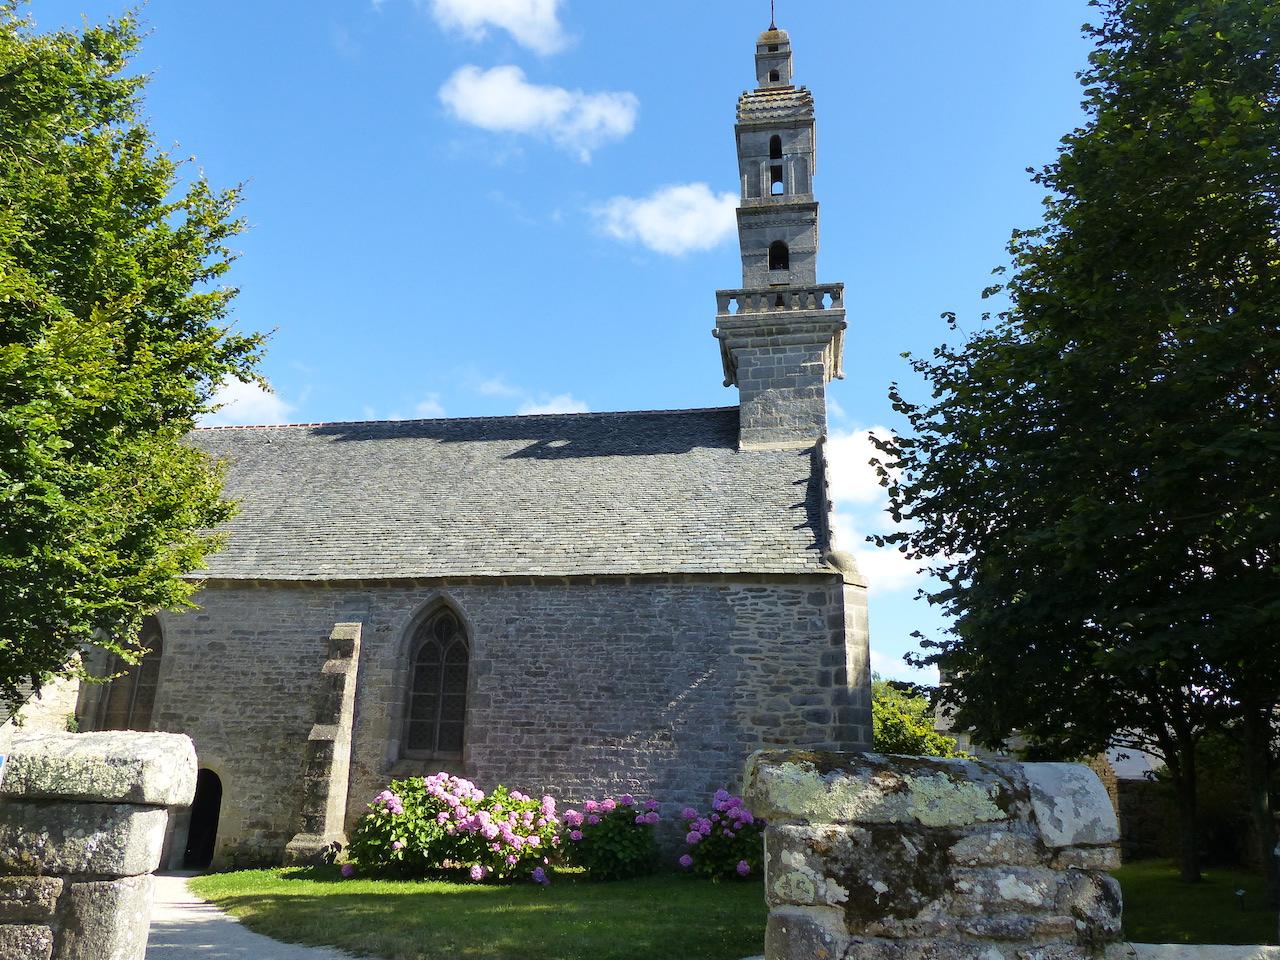 Chapelle de Kersaint 15